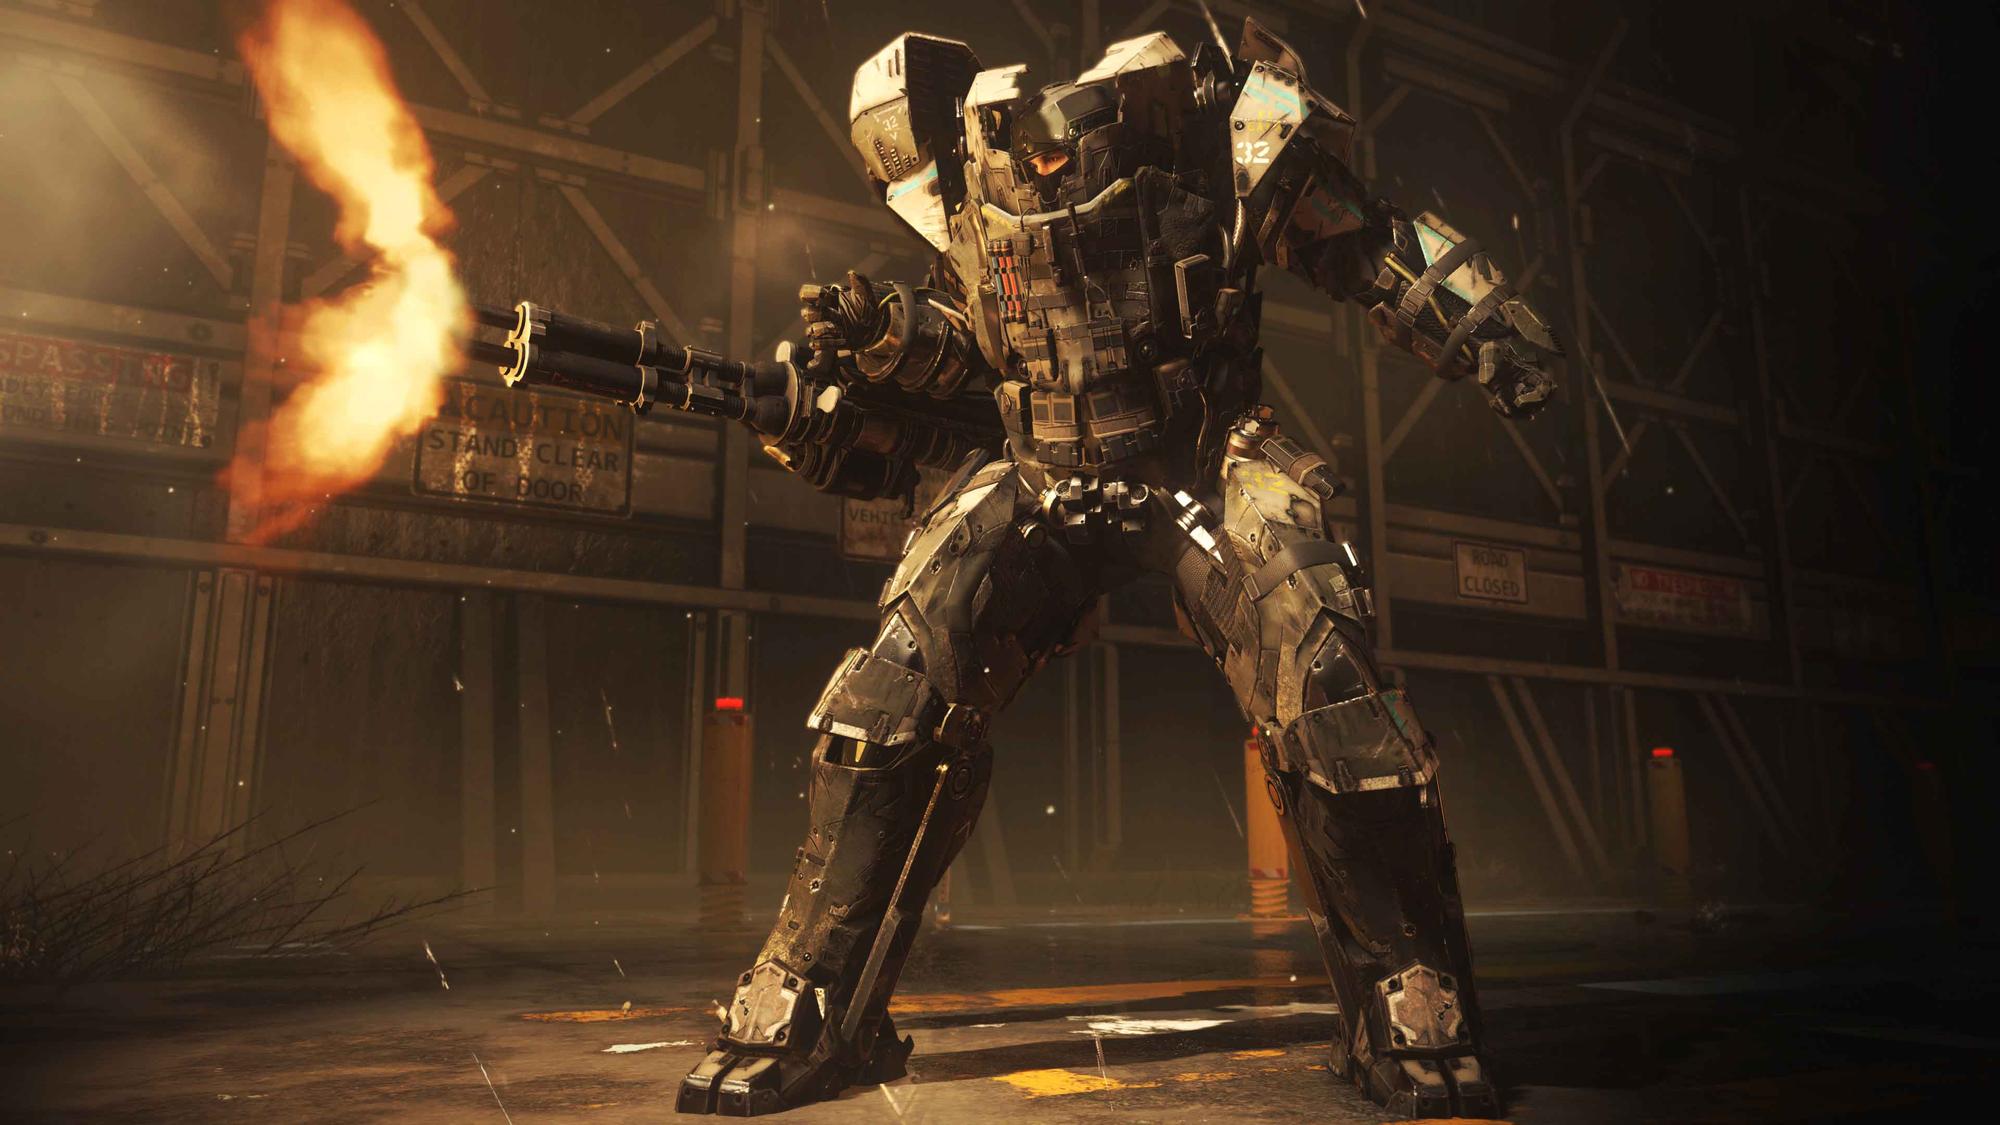 Xs1 Goliath Concept Art Google Search Call Of Duty Aw Call Of Duty Advanced Warfare